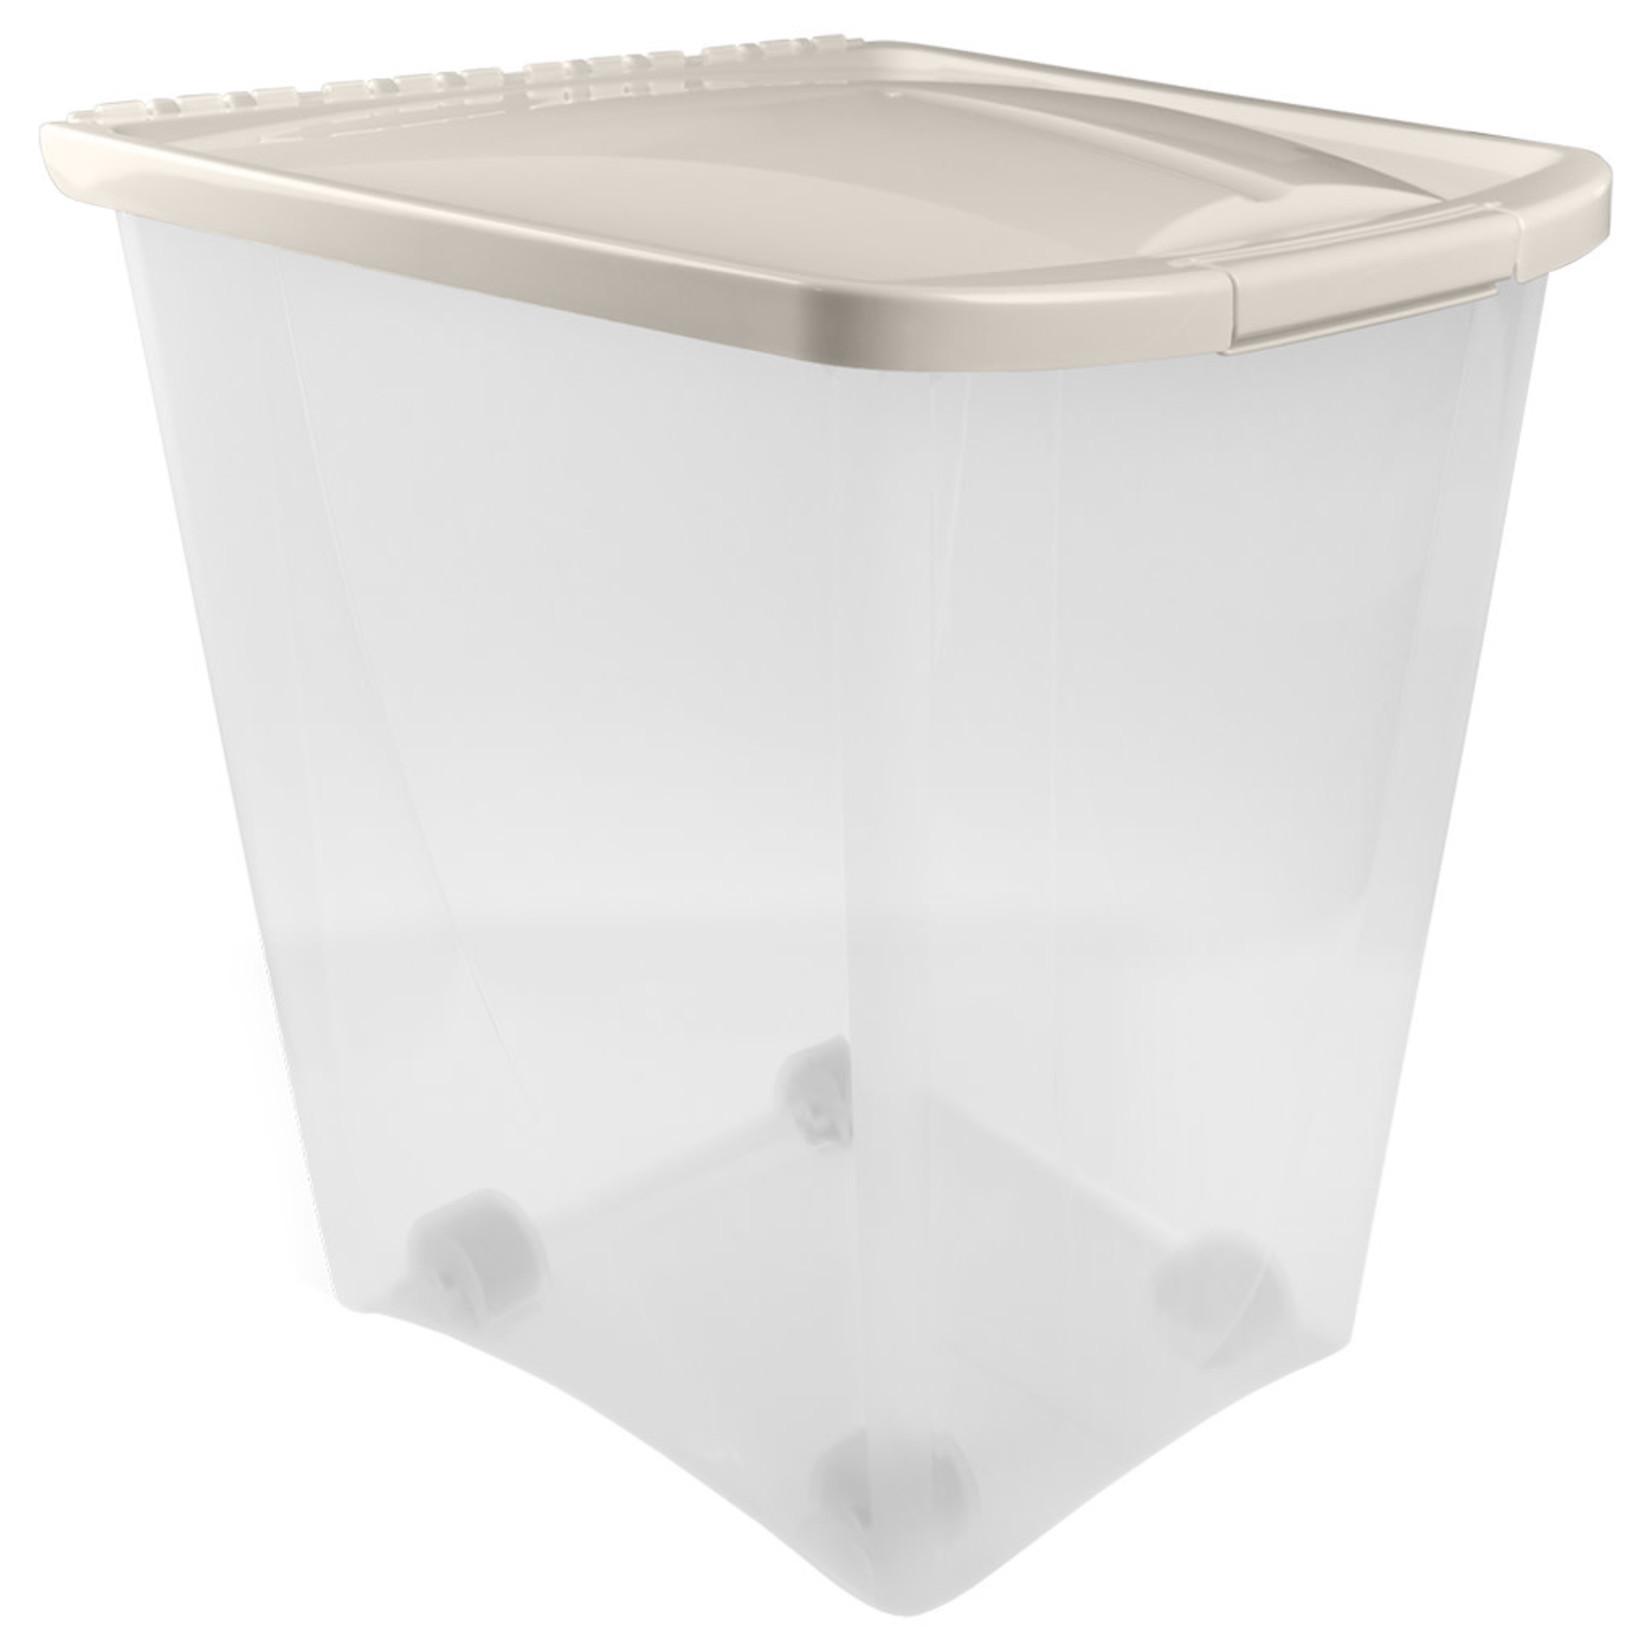 Van Ness Food Container XLarge 50LB